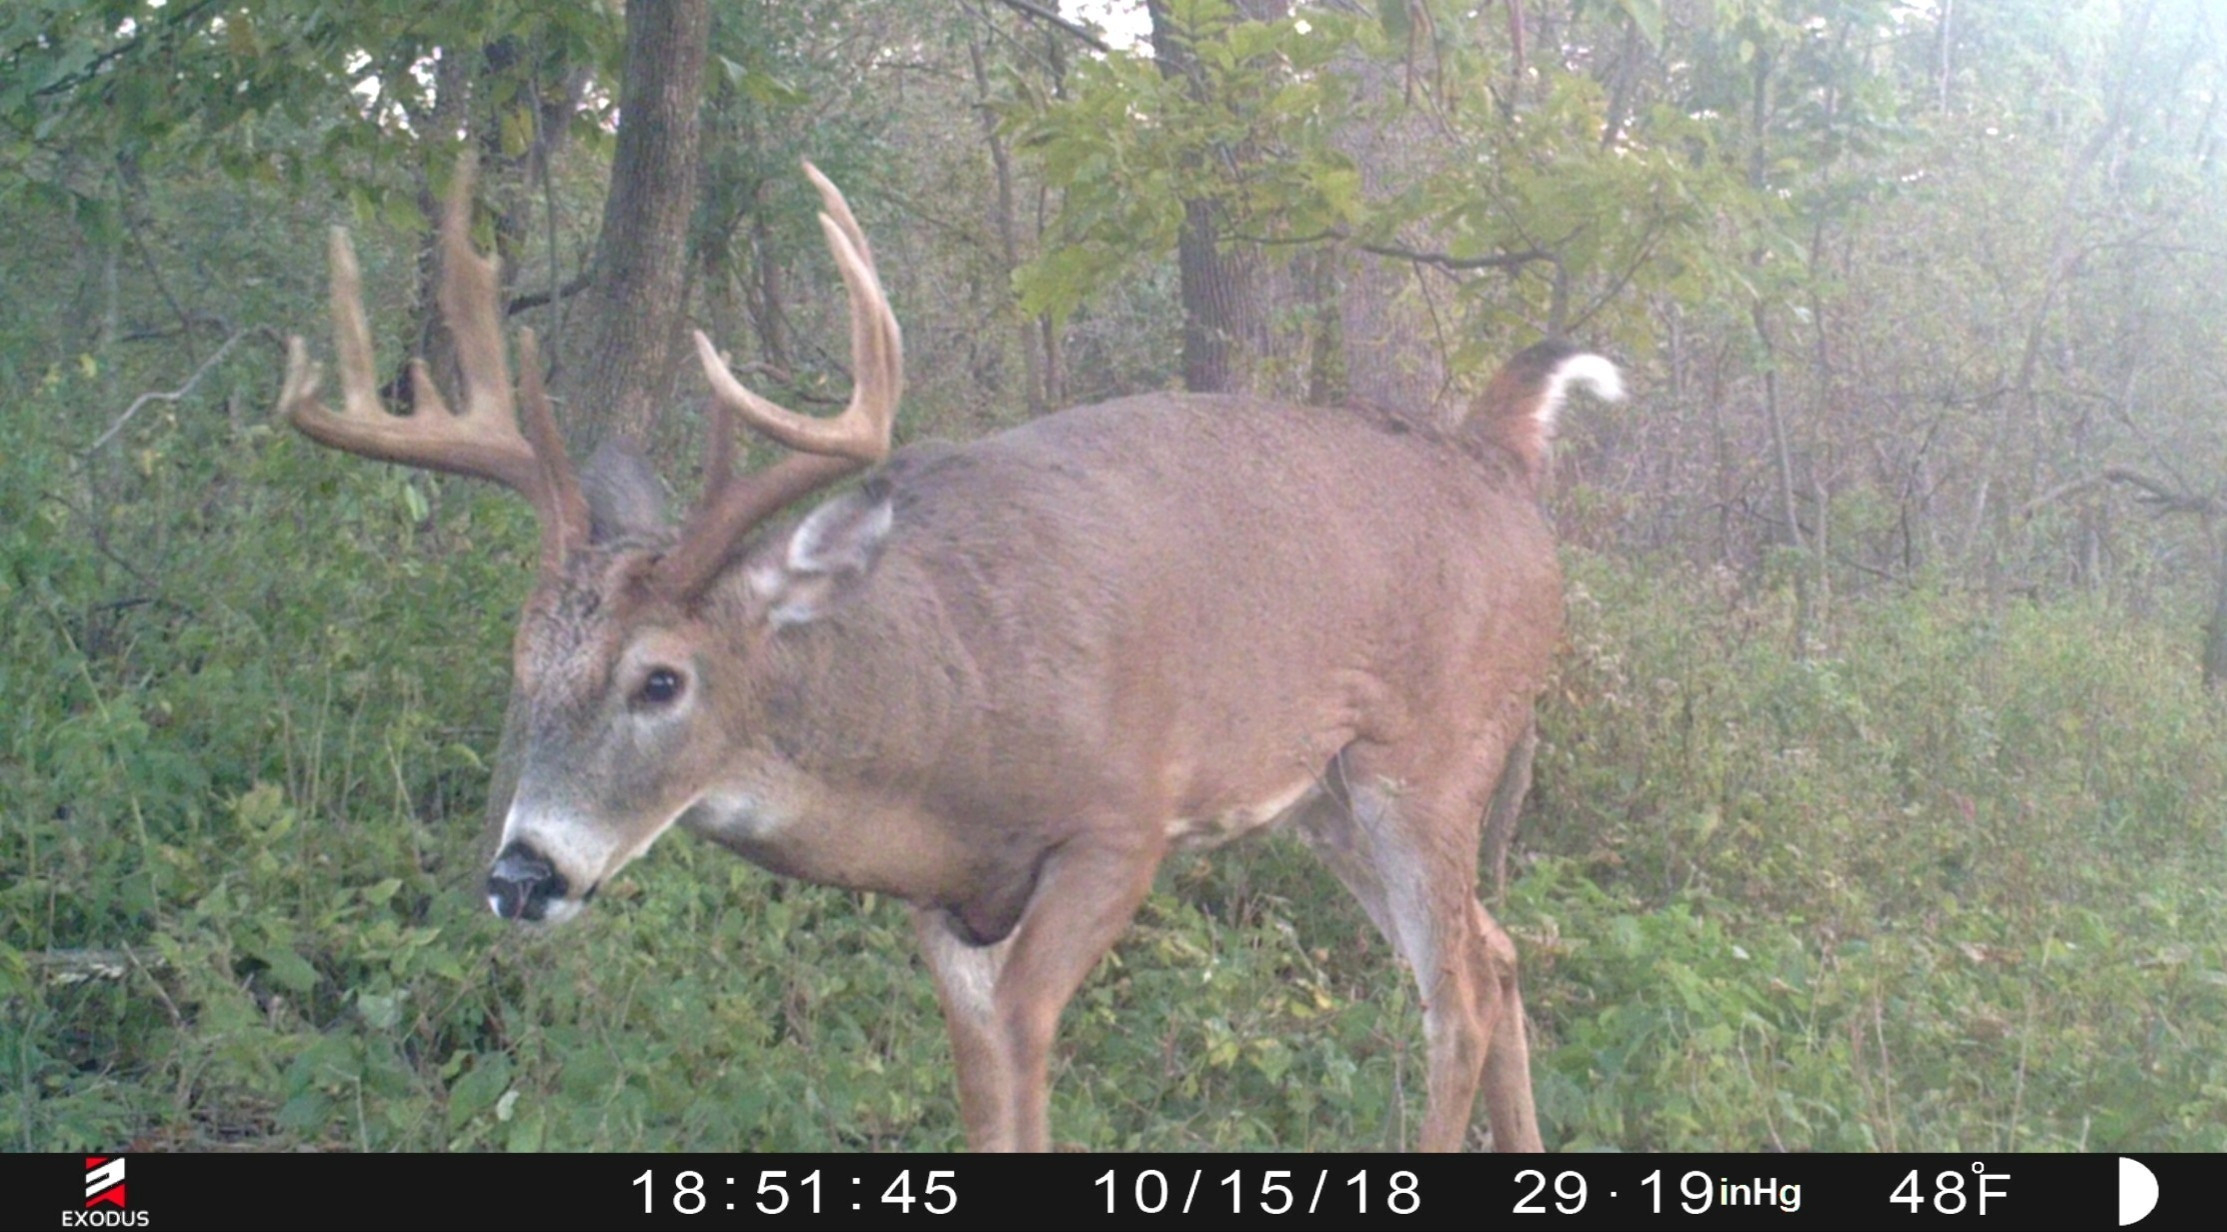 2021 Deer Rut Forecast - Template Calendar Design  Deer Rut Forecast For 2021